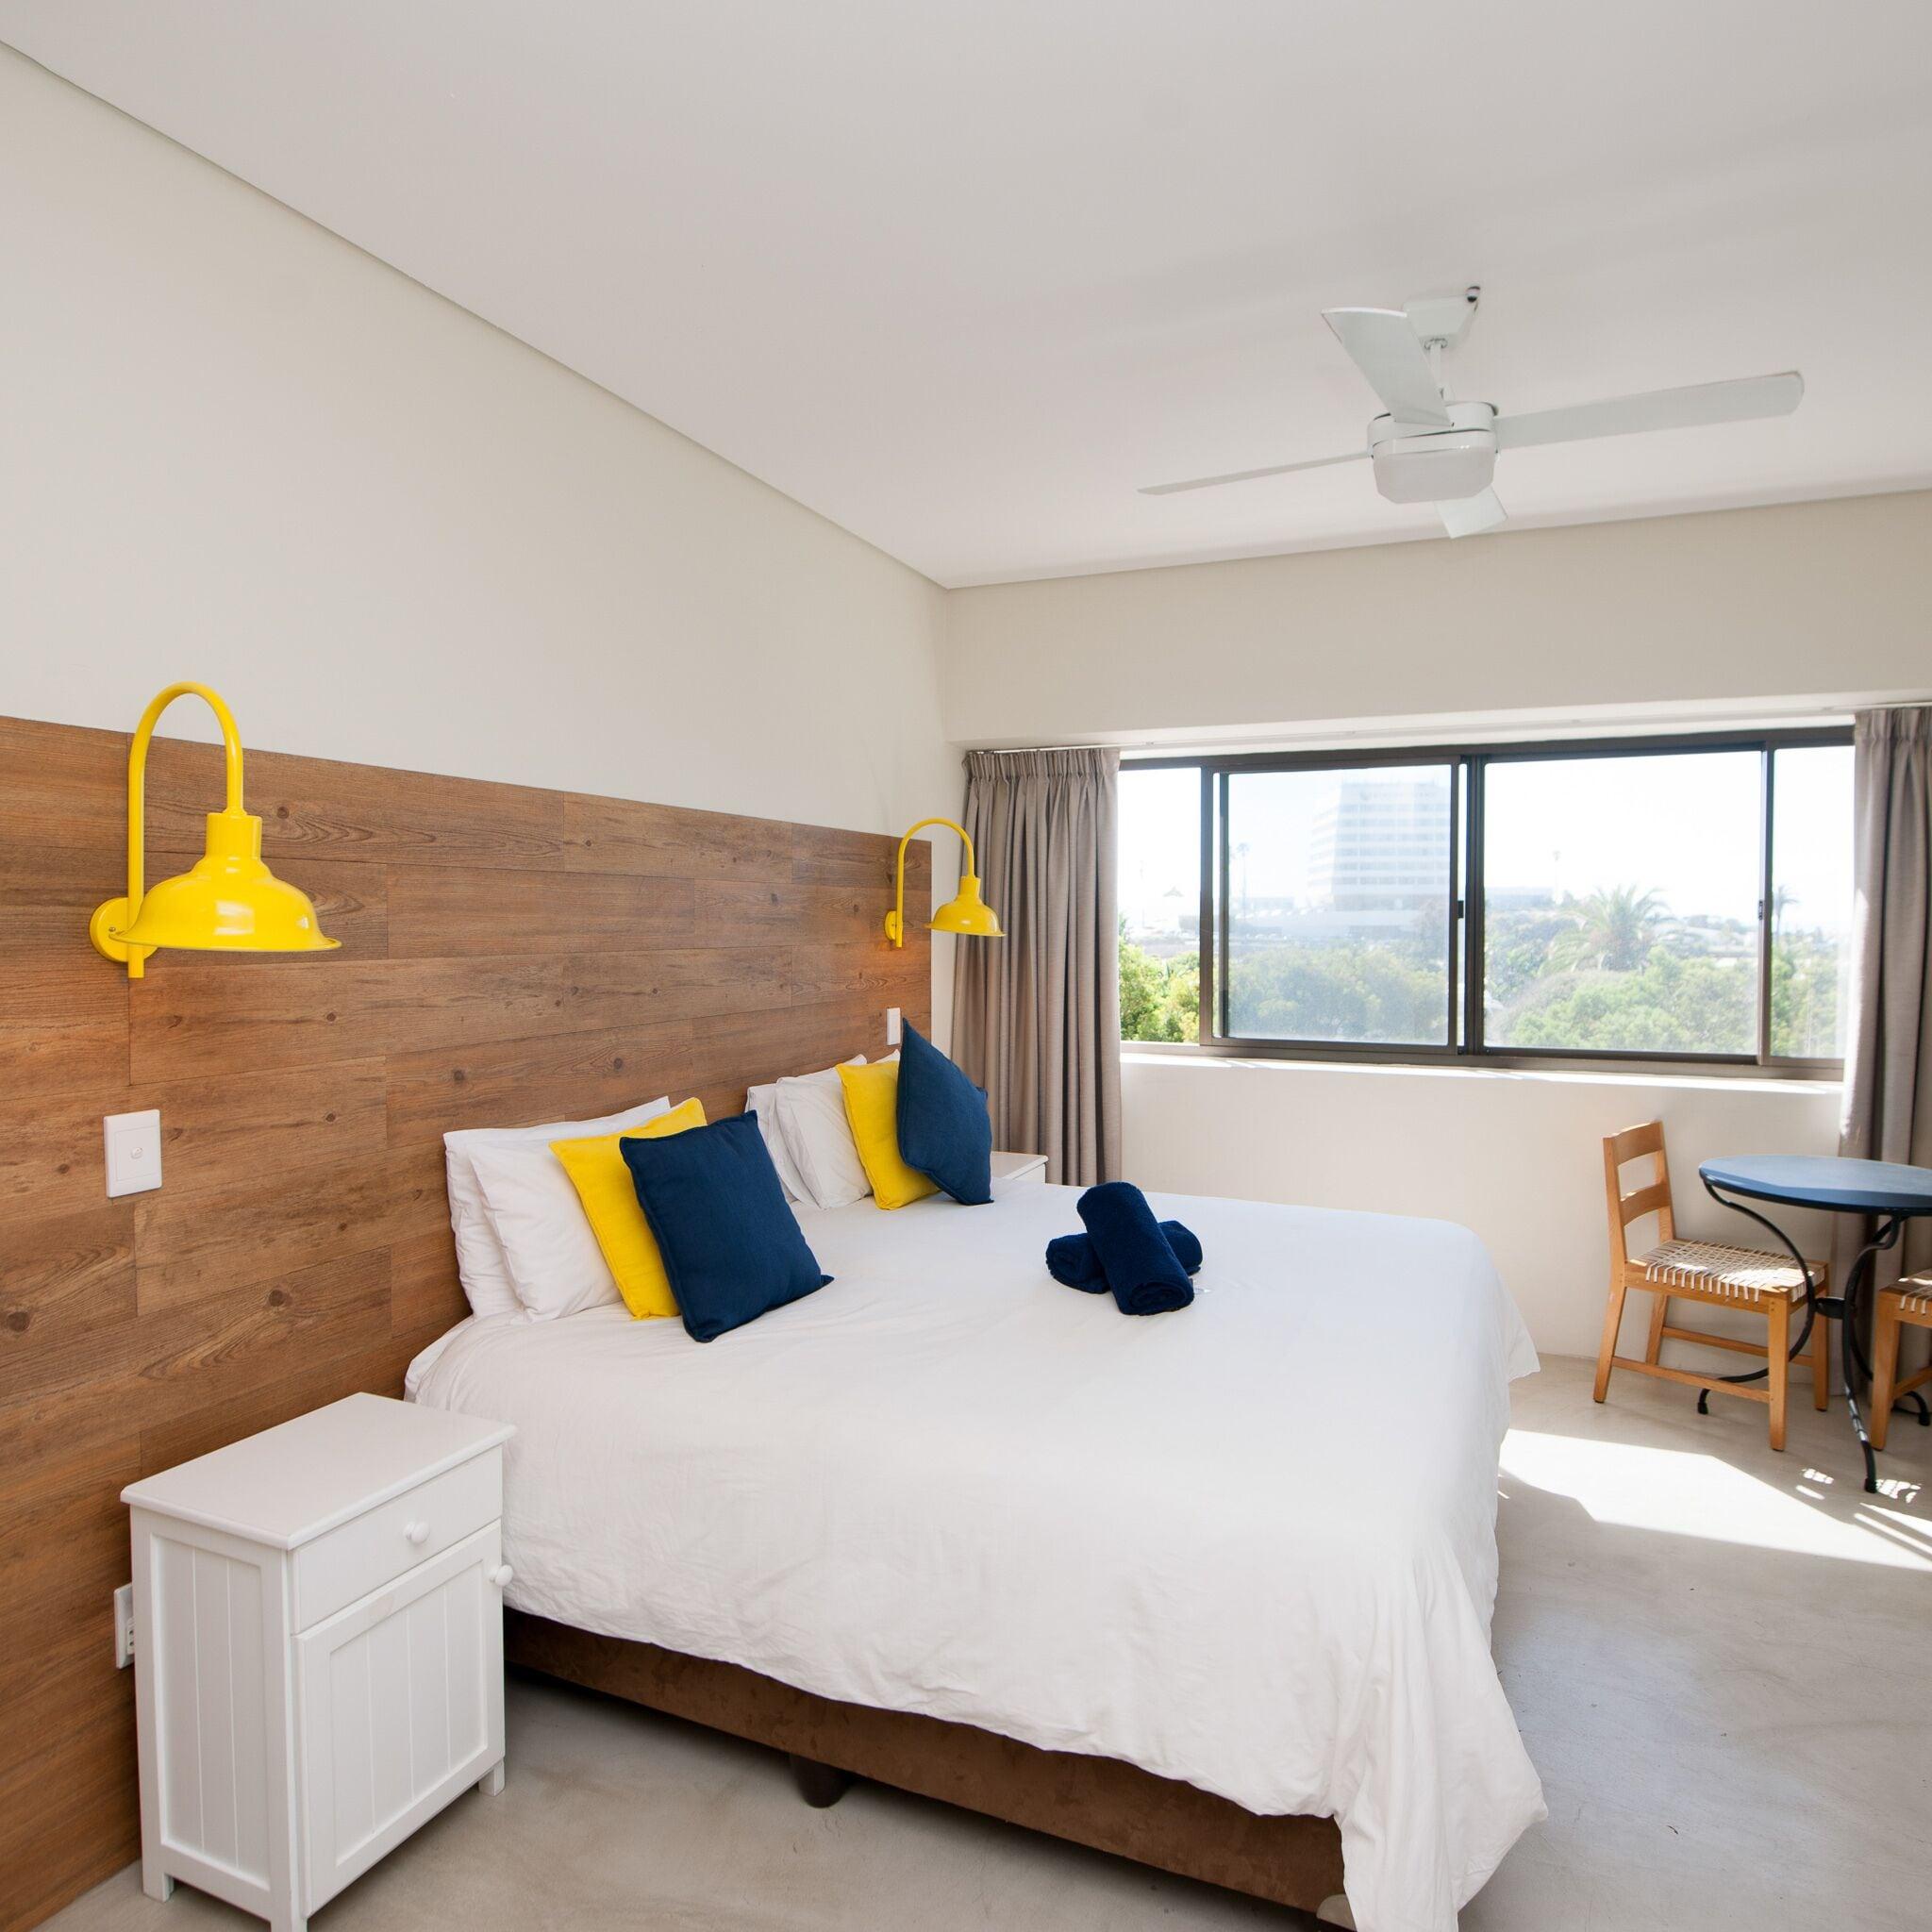 Plett Beachfront Accommodation